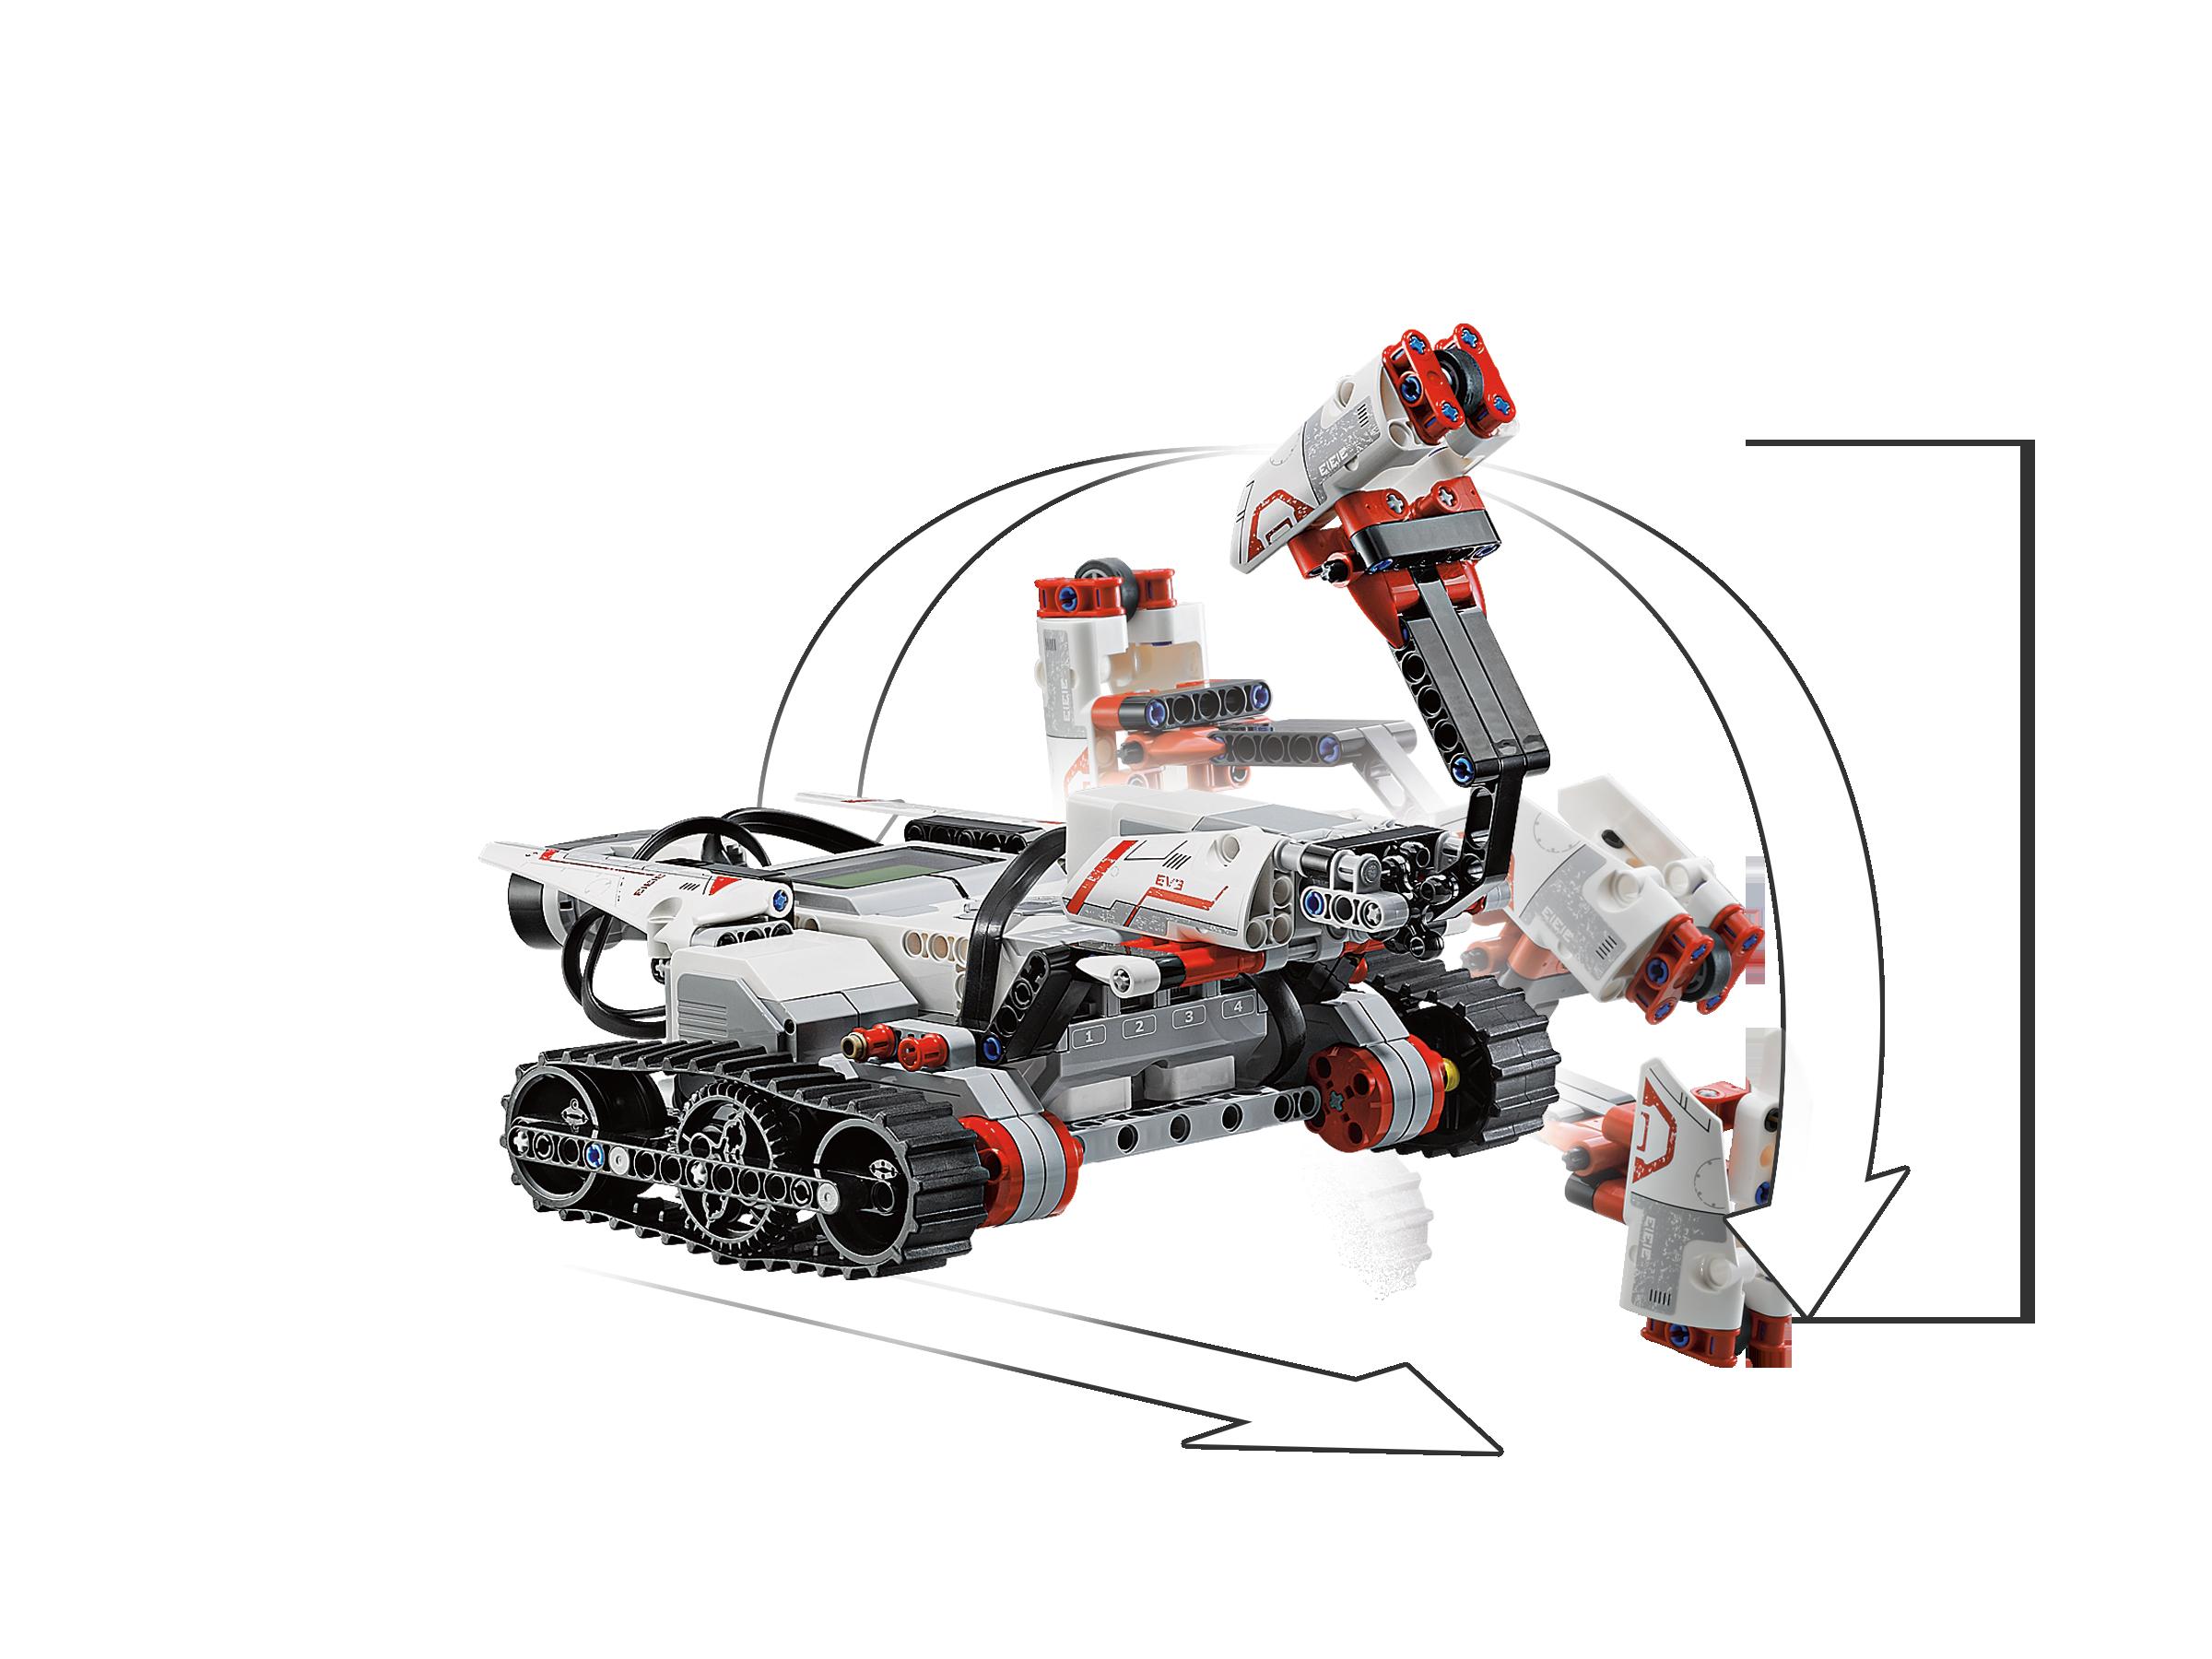 Lego Mindstorms Ev3 31313 Toys Heaven Pinterest Amazoncom Snap Circuits Sc300 Electronics Discovery Kit